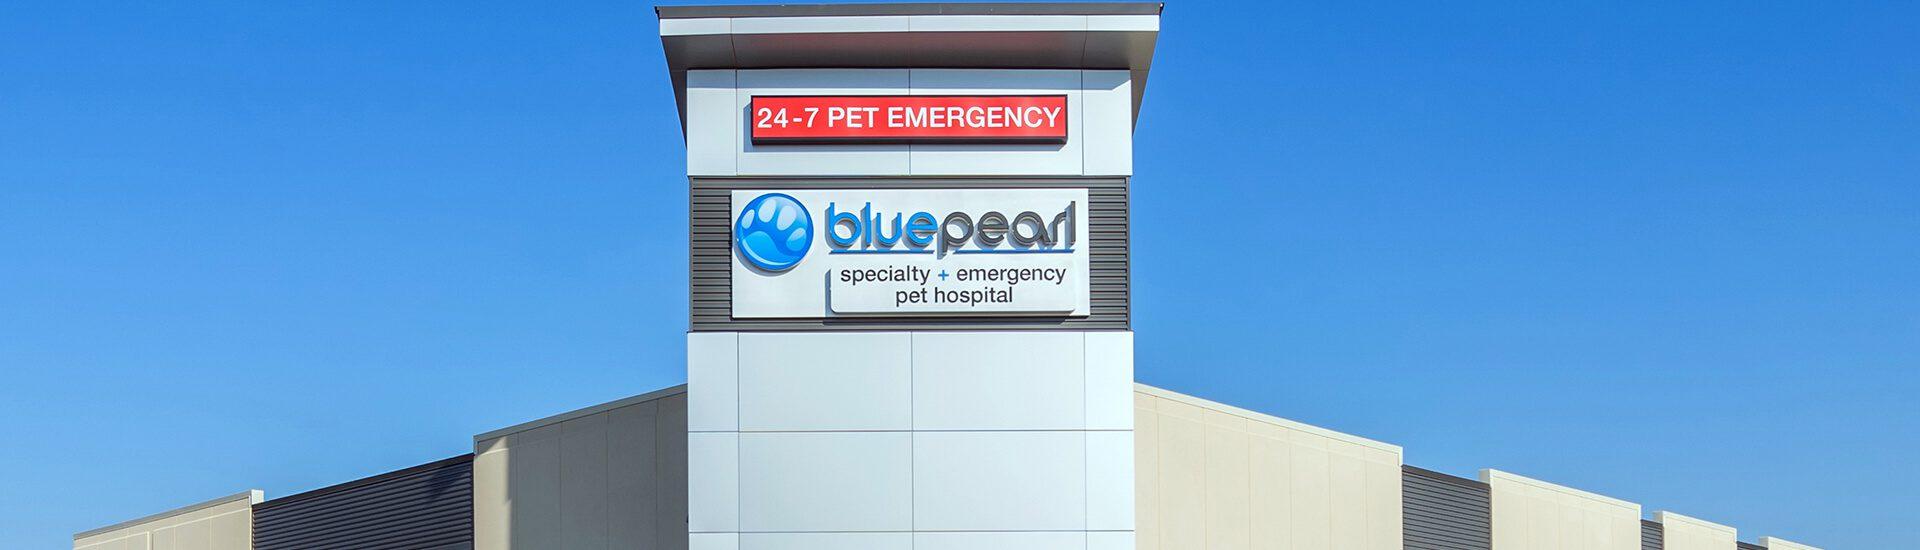 bluepearl pet hospital oklahoma city ok emergency vet. Black Bedroom Furniture Sets. Home Design Ideas